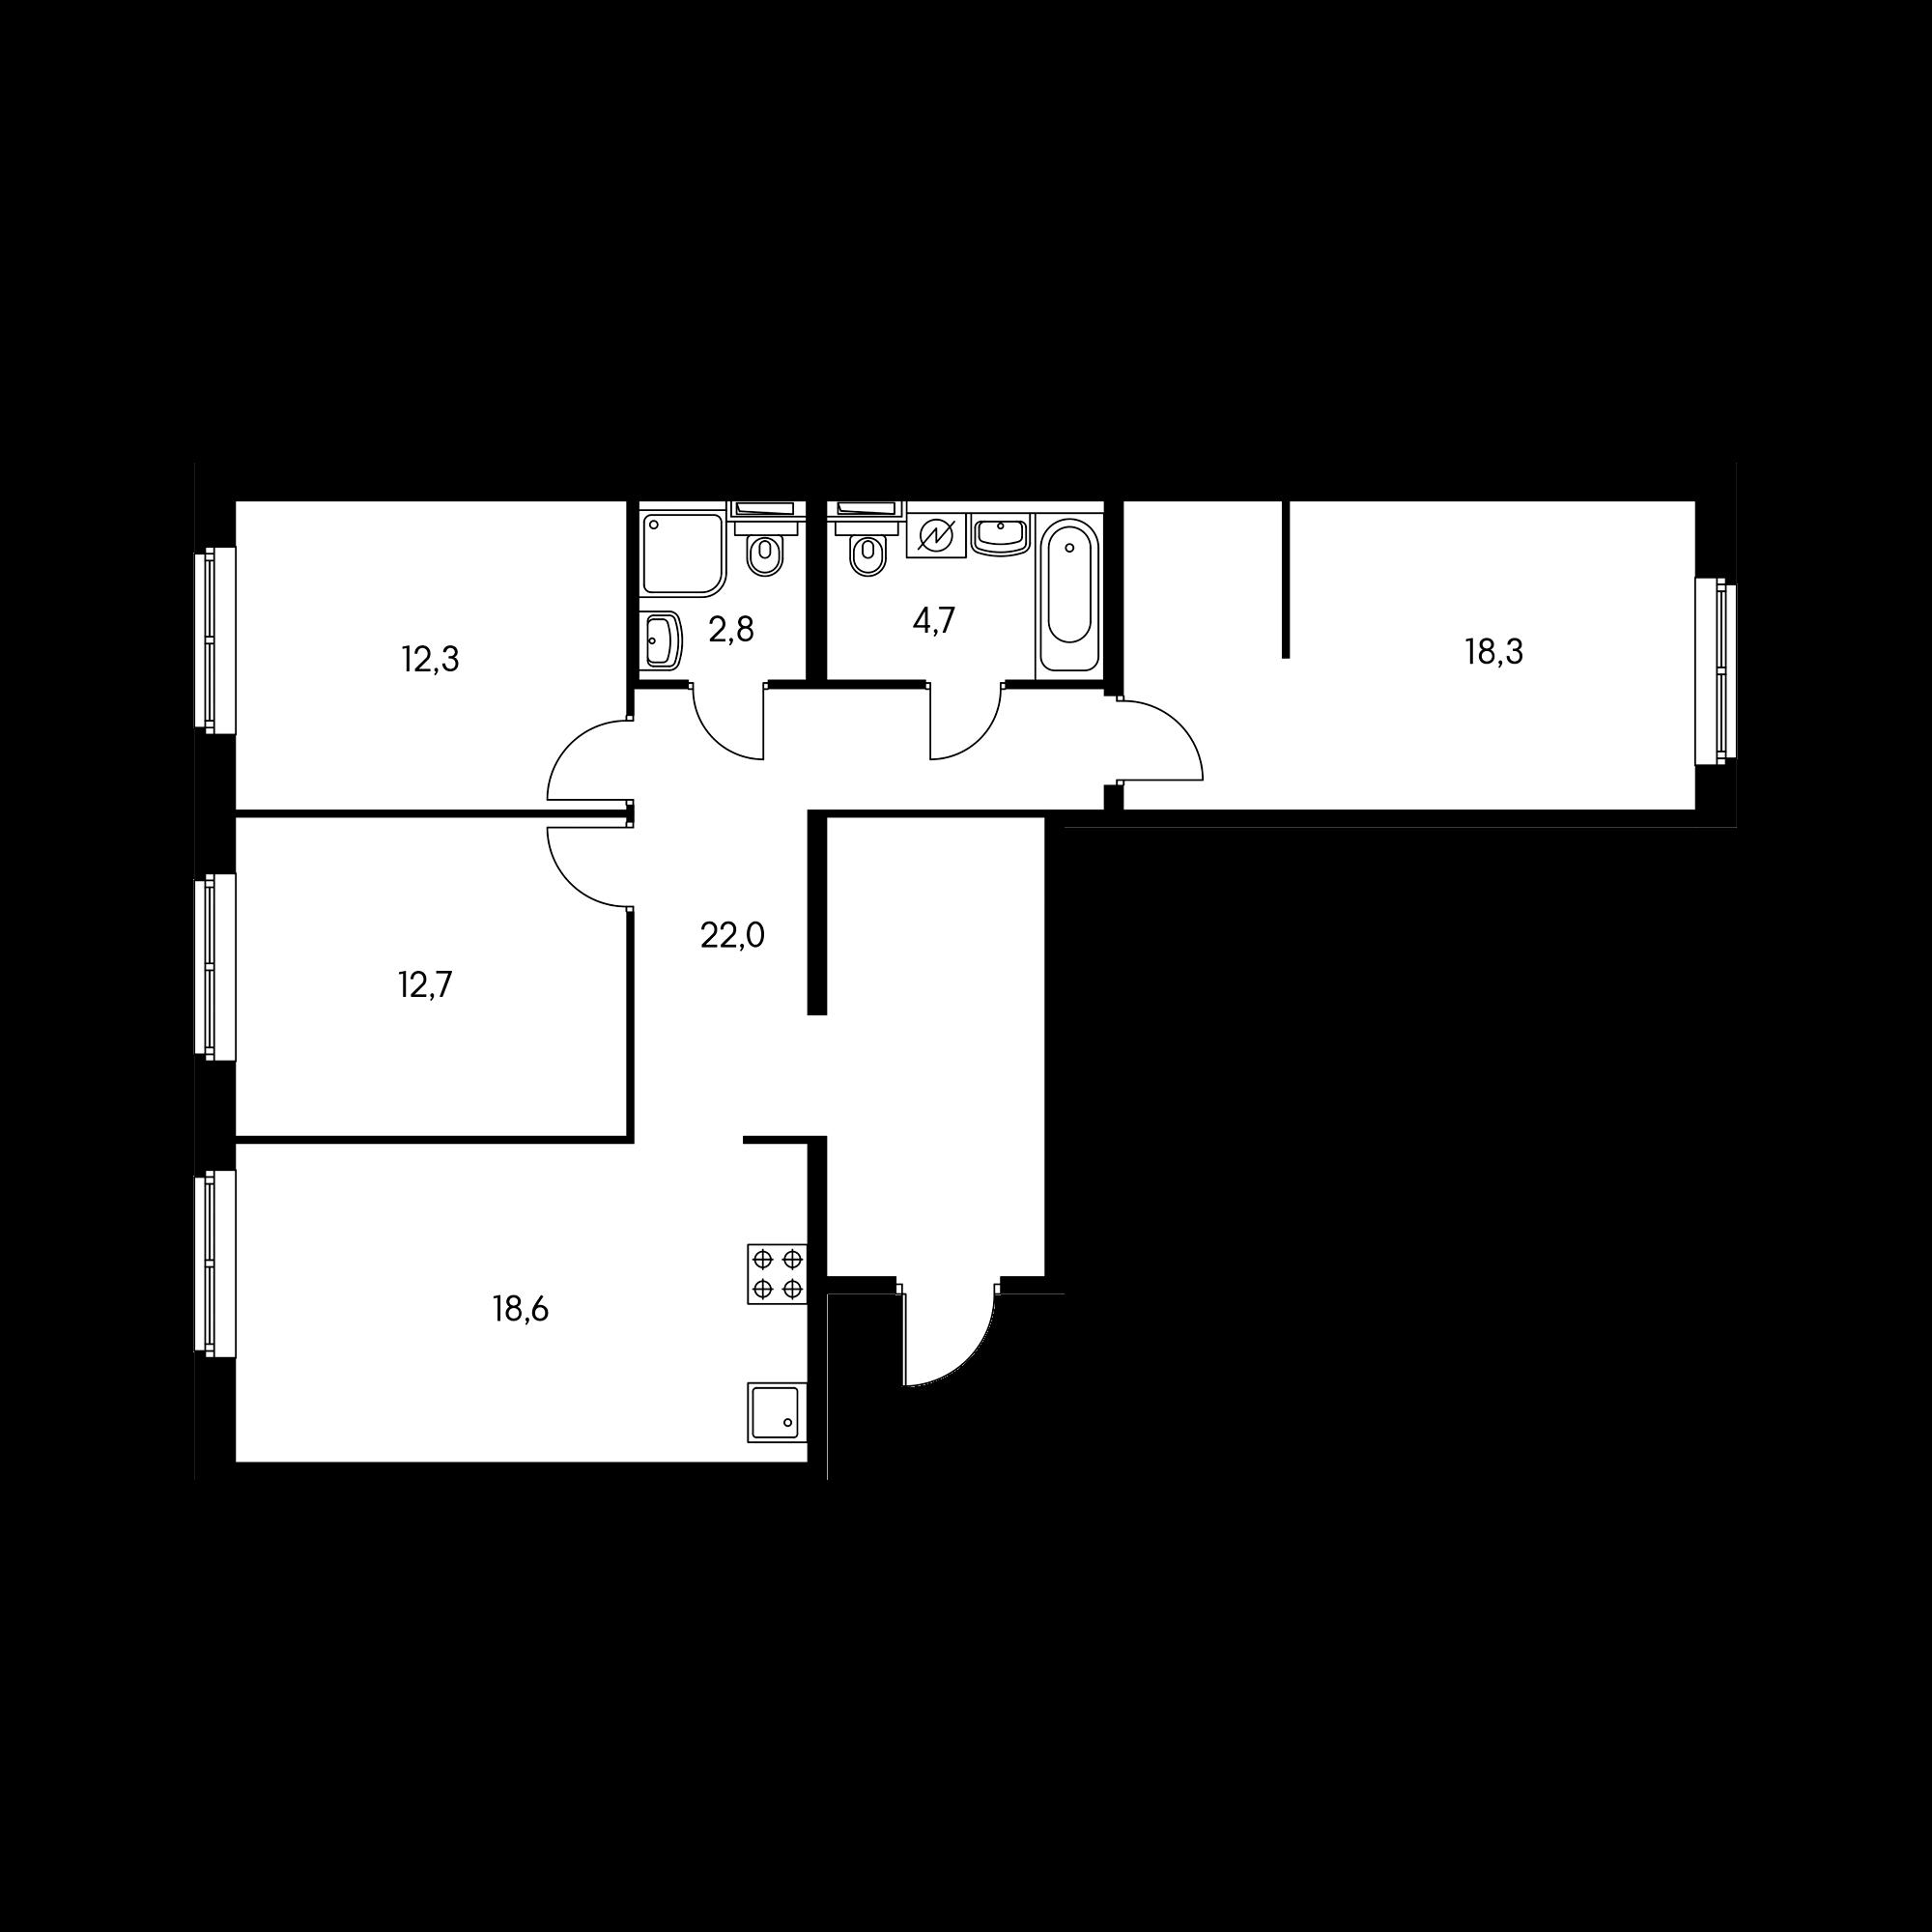 3EL4_9.9-1